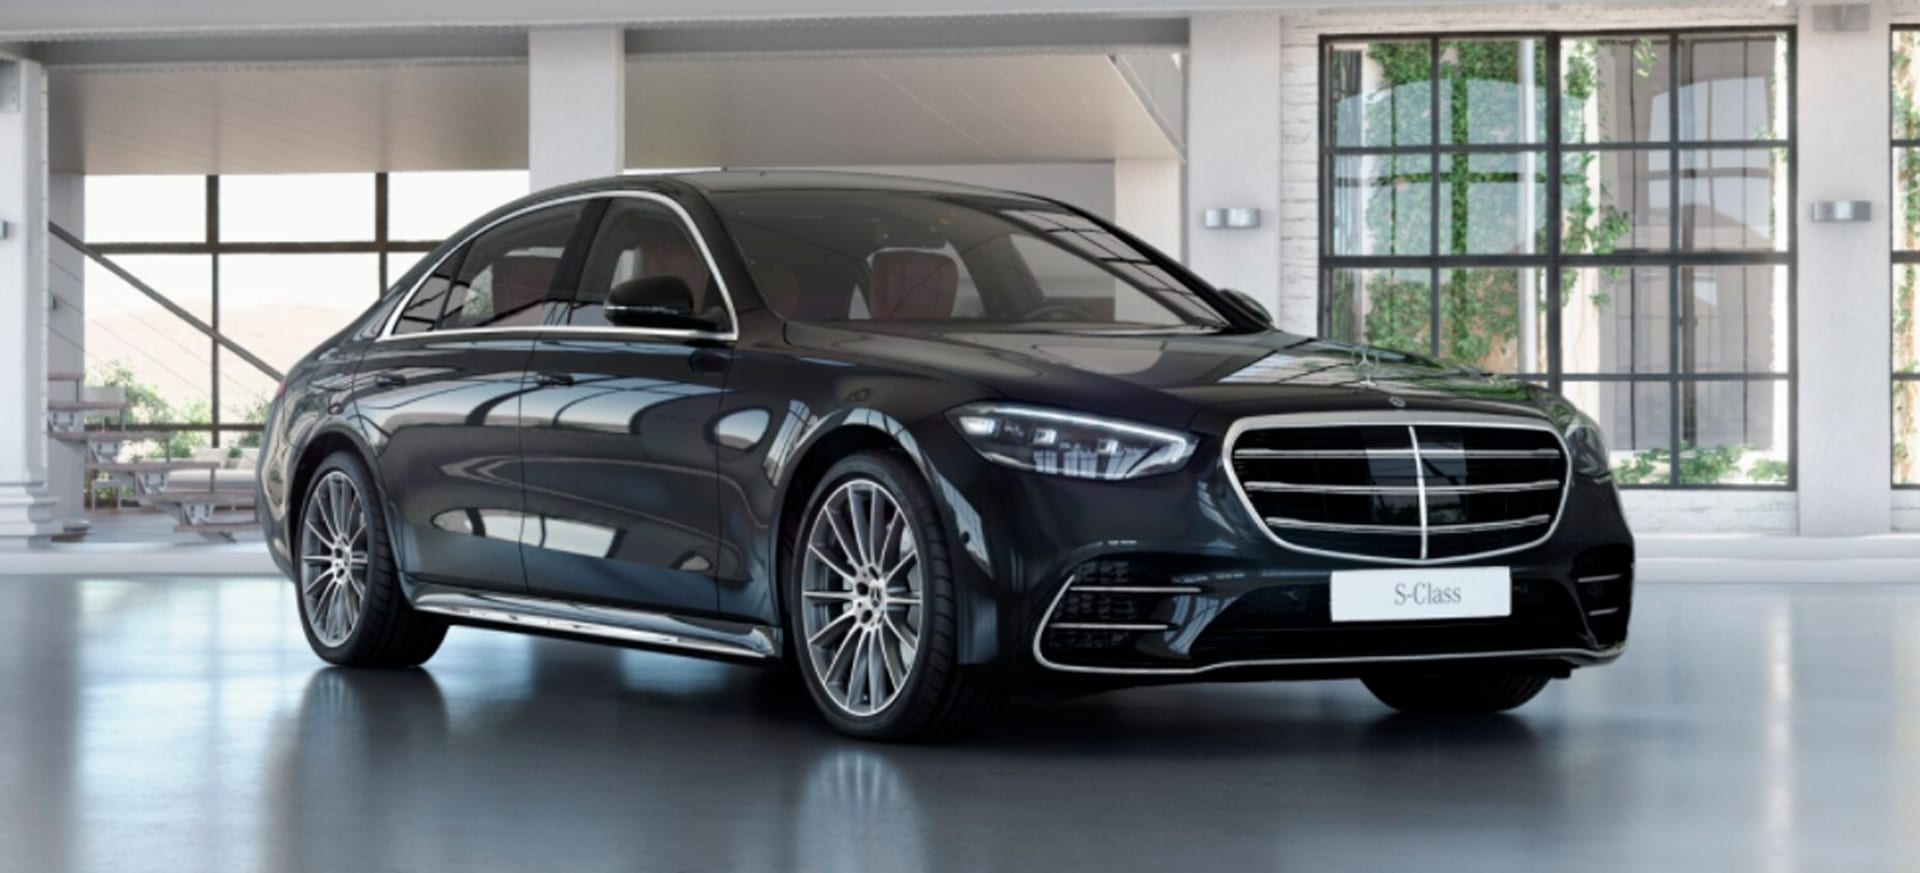 Mercedes-Benz S-Class Limousine 0152601519